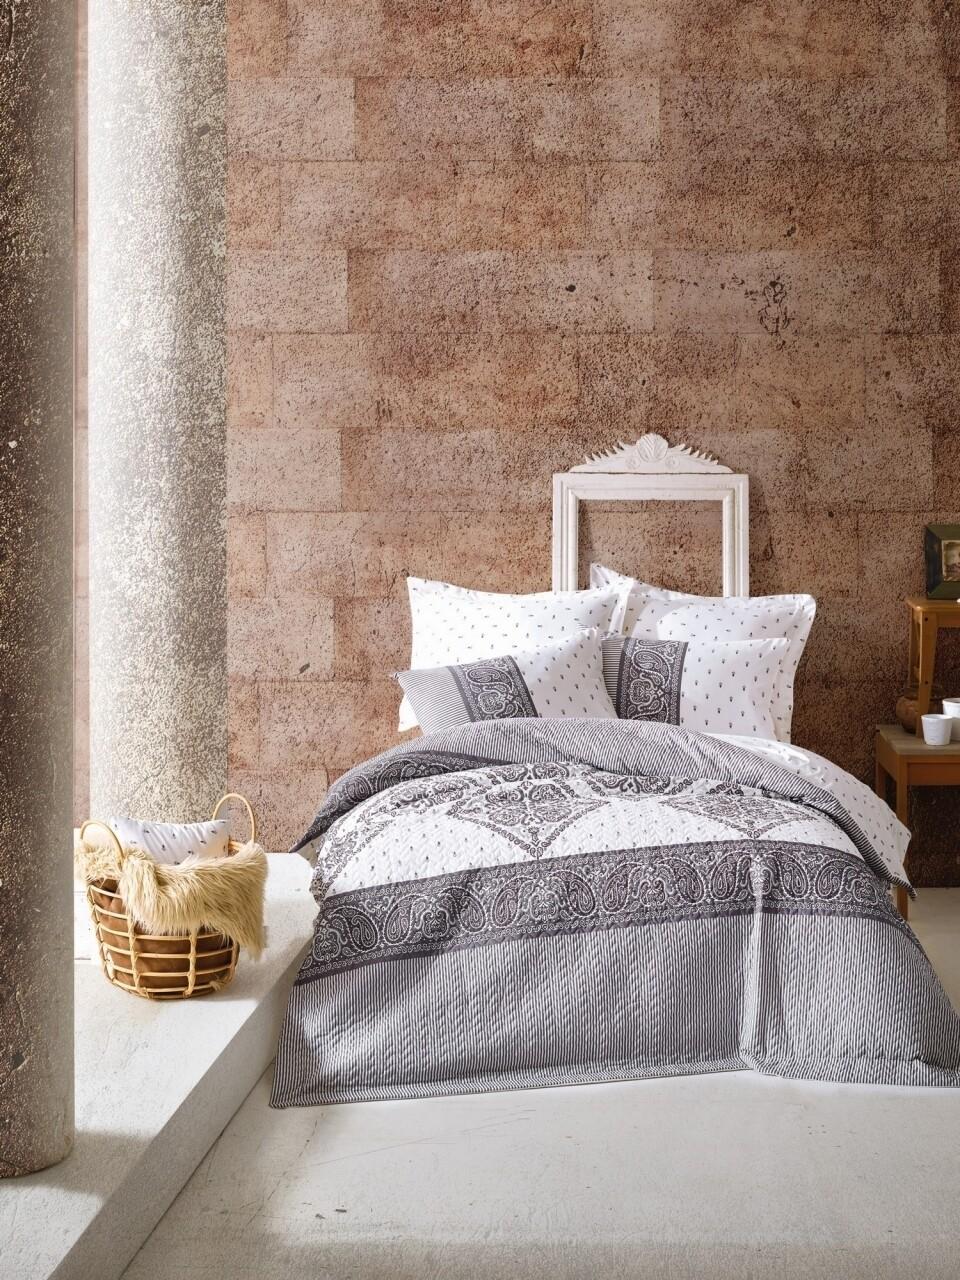 Lenjerie de pat matlasata pentru o persoana, 3 piese, 100% bumbac ranforce, Cotton Box, Alope Grey